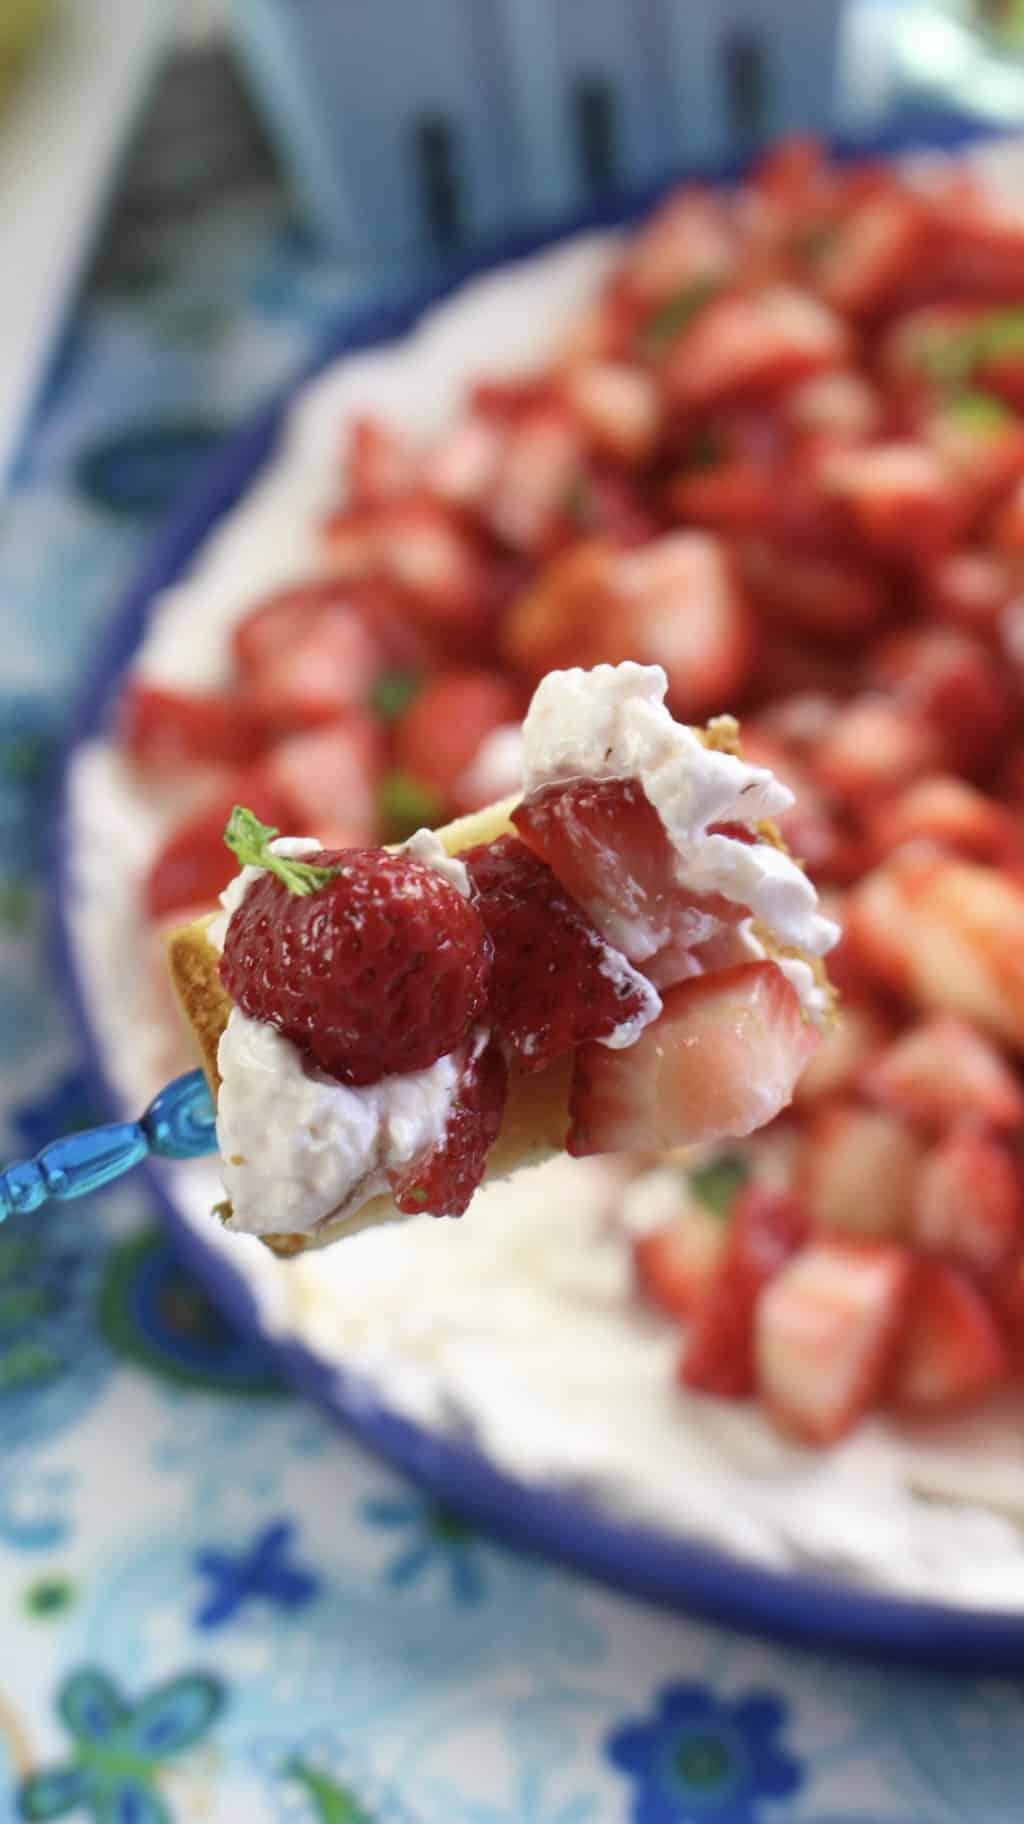 cream sauce for strawberries